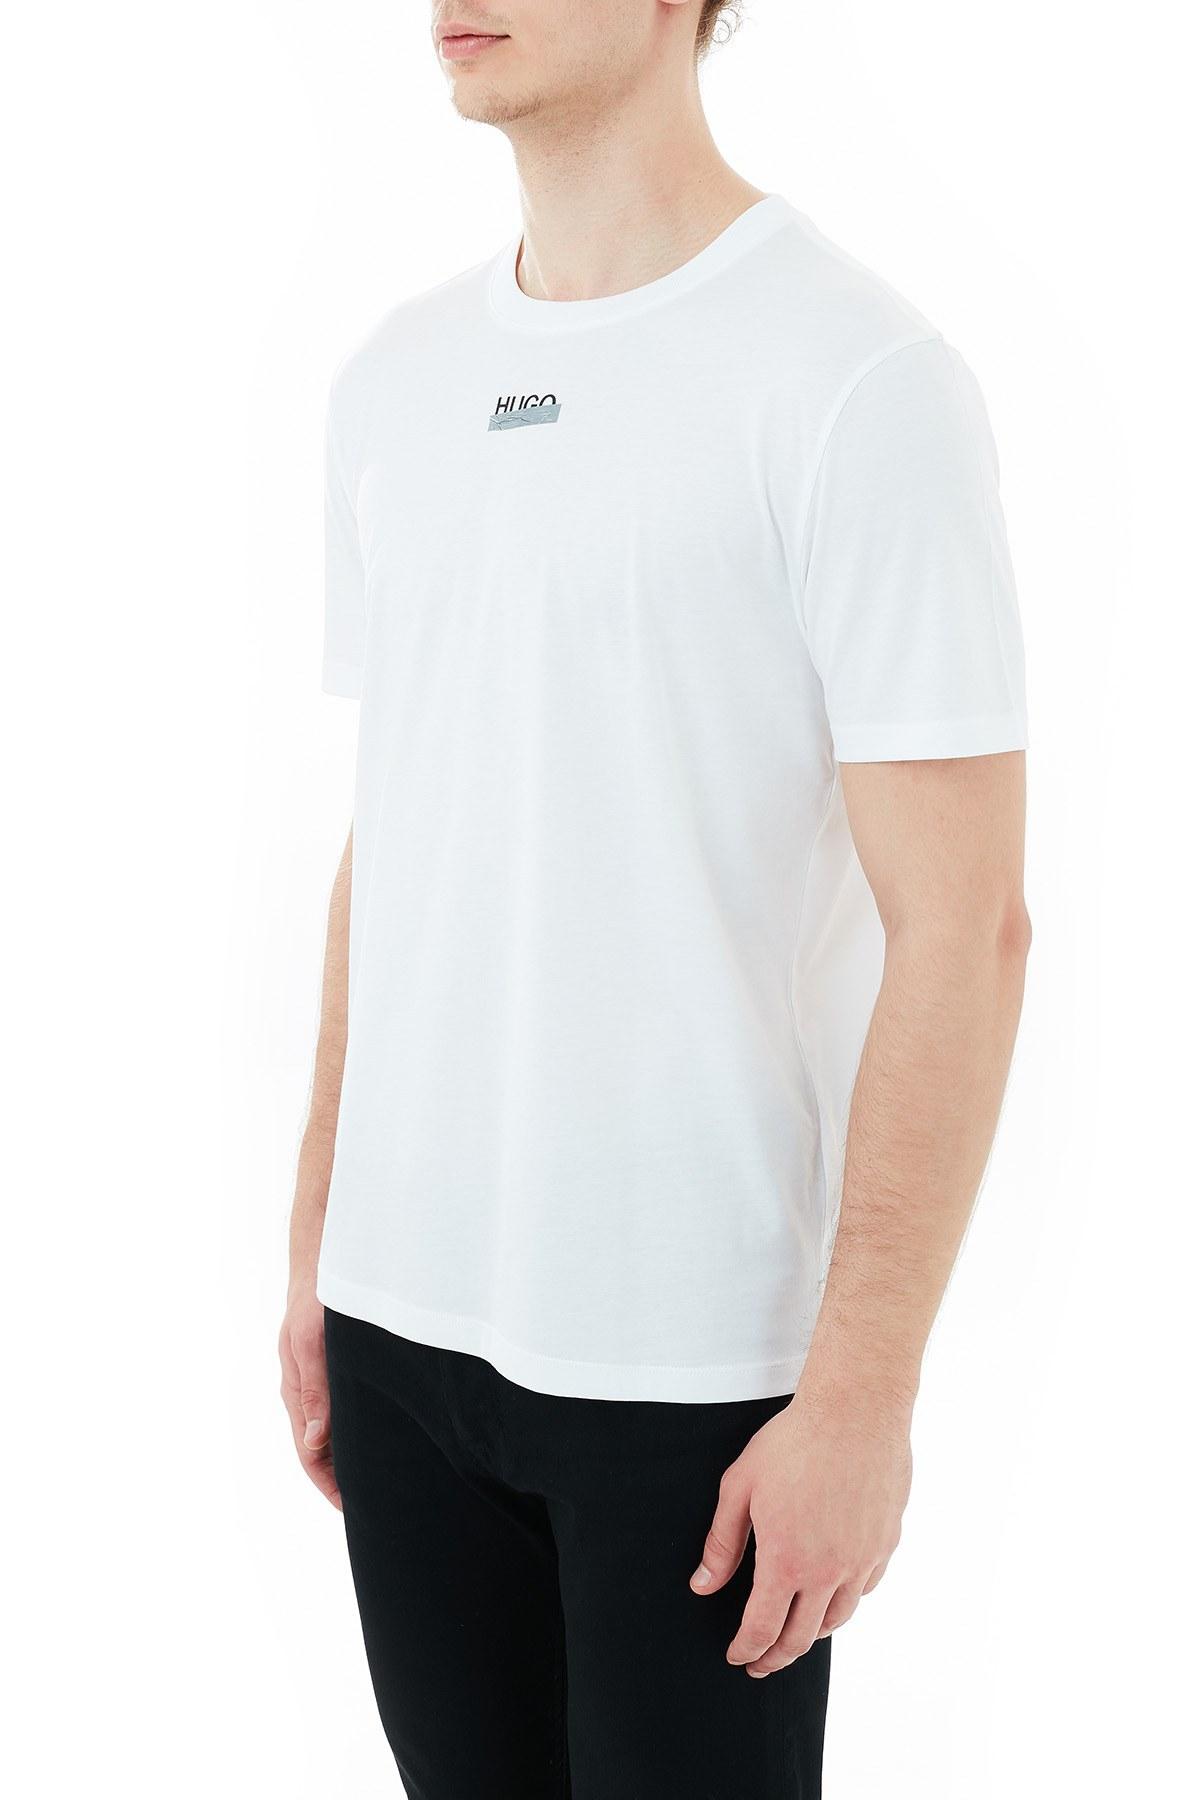 Hugo Boss Regular Fit Baskılı Bisiklet Yaka % 100 Pamuk Erkek T Shirt 50435529 100 BEYAZ